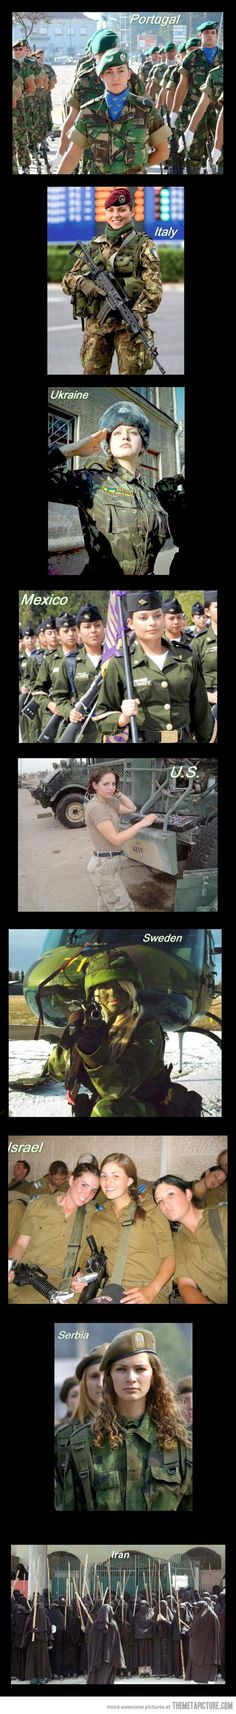 Army women around the world